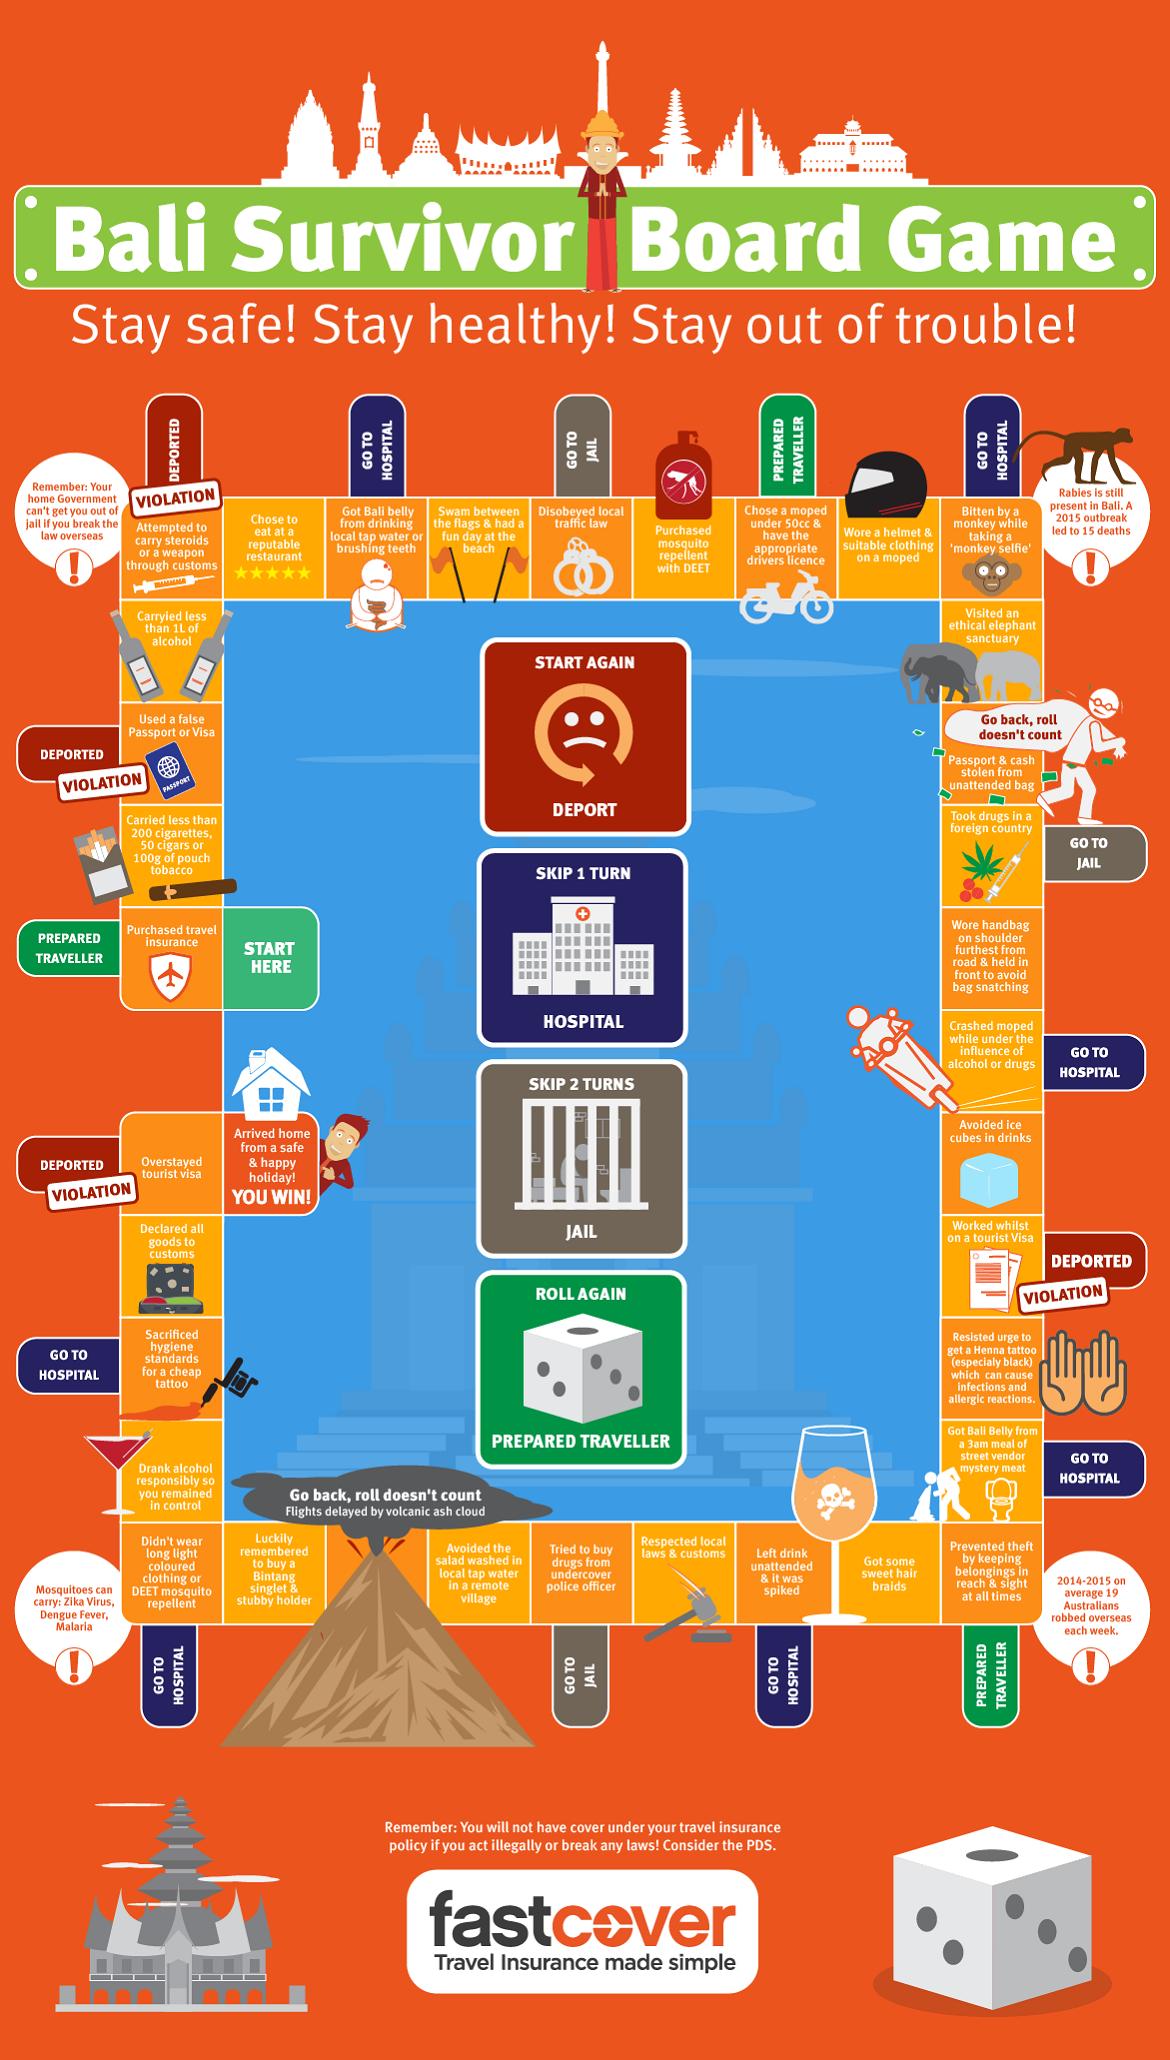 bali-survivor-travel-insurance-board-game-infographic